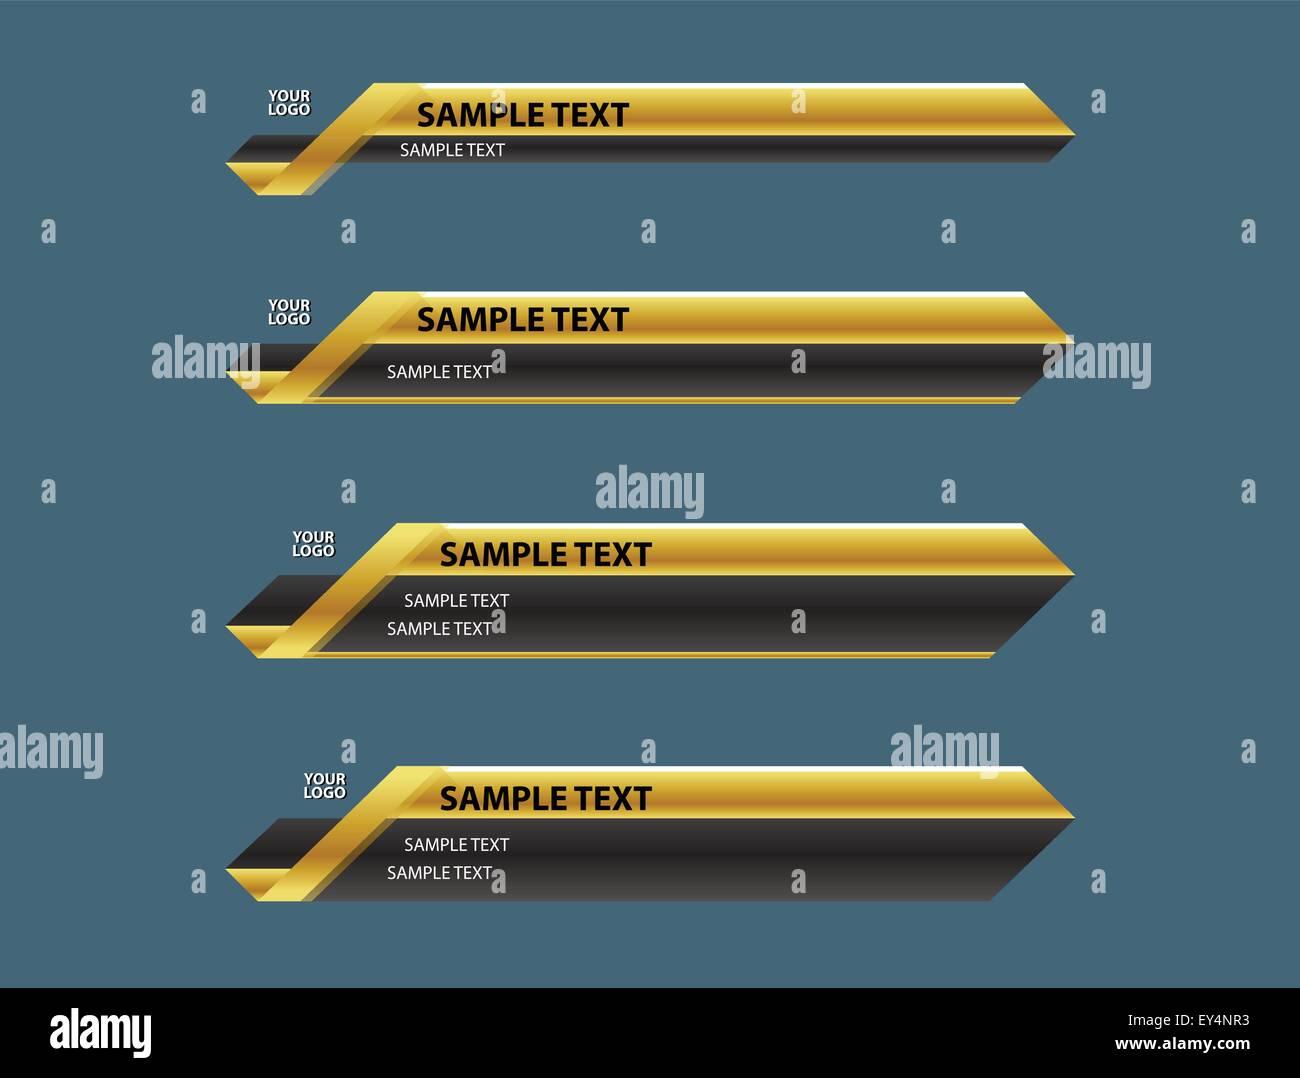 lower third banner bar name screen TV - Stock Image